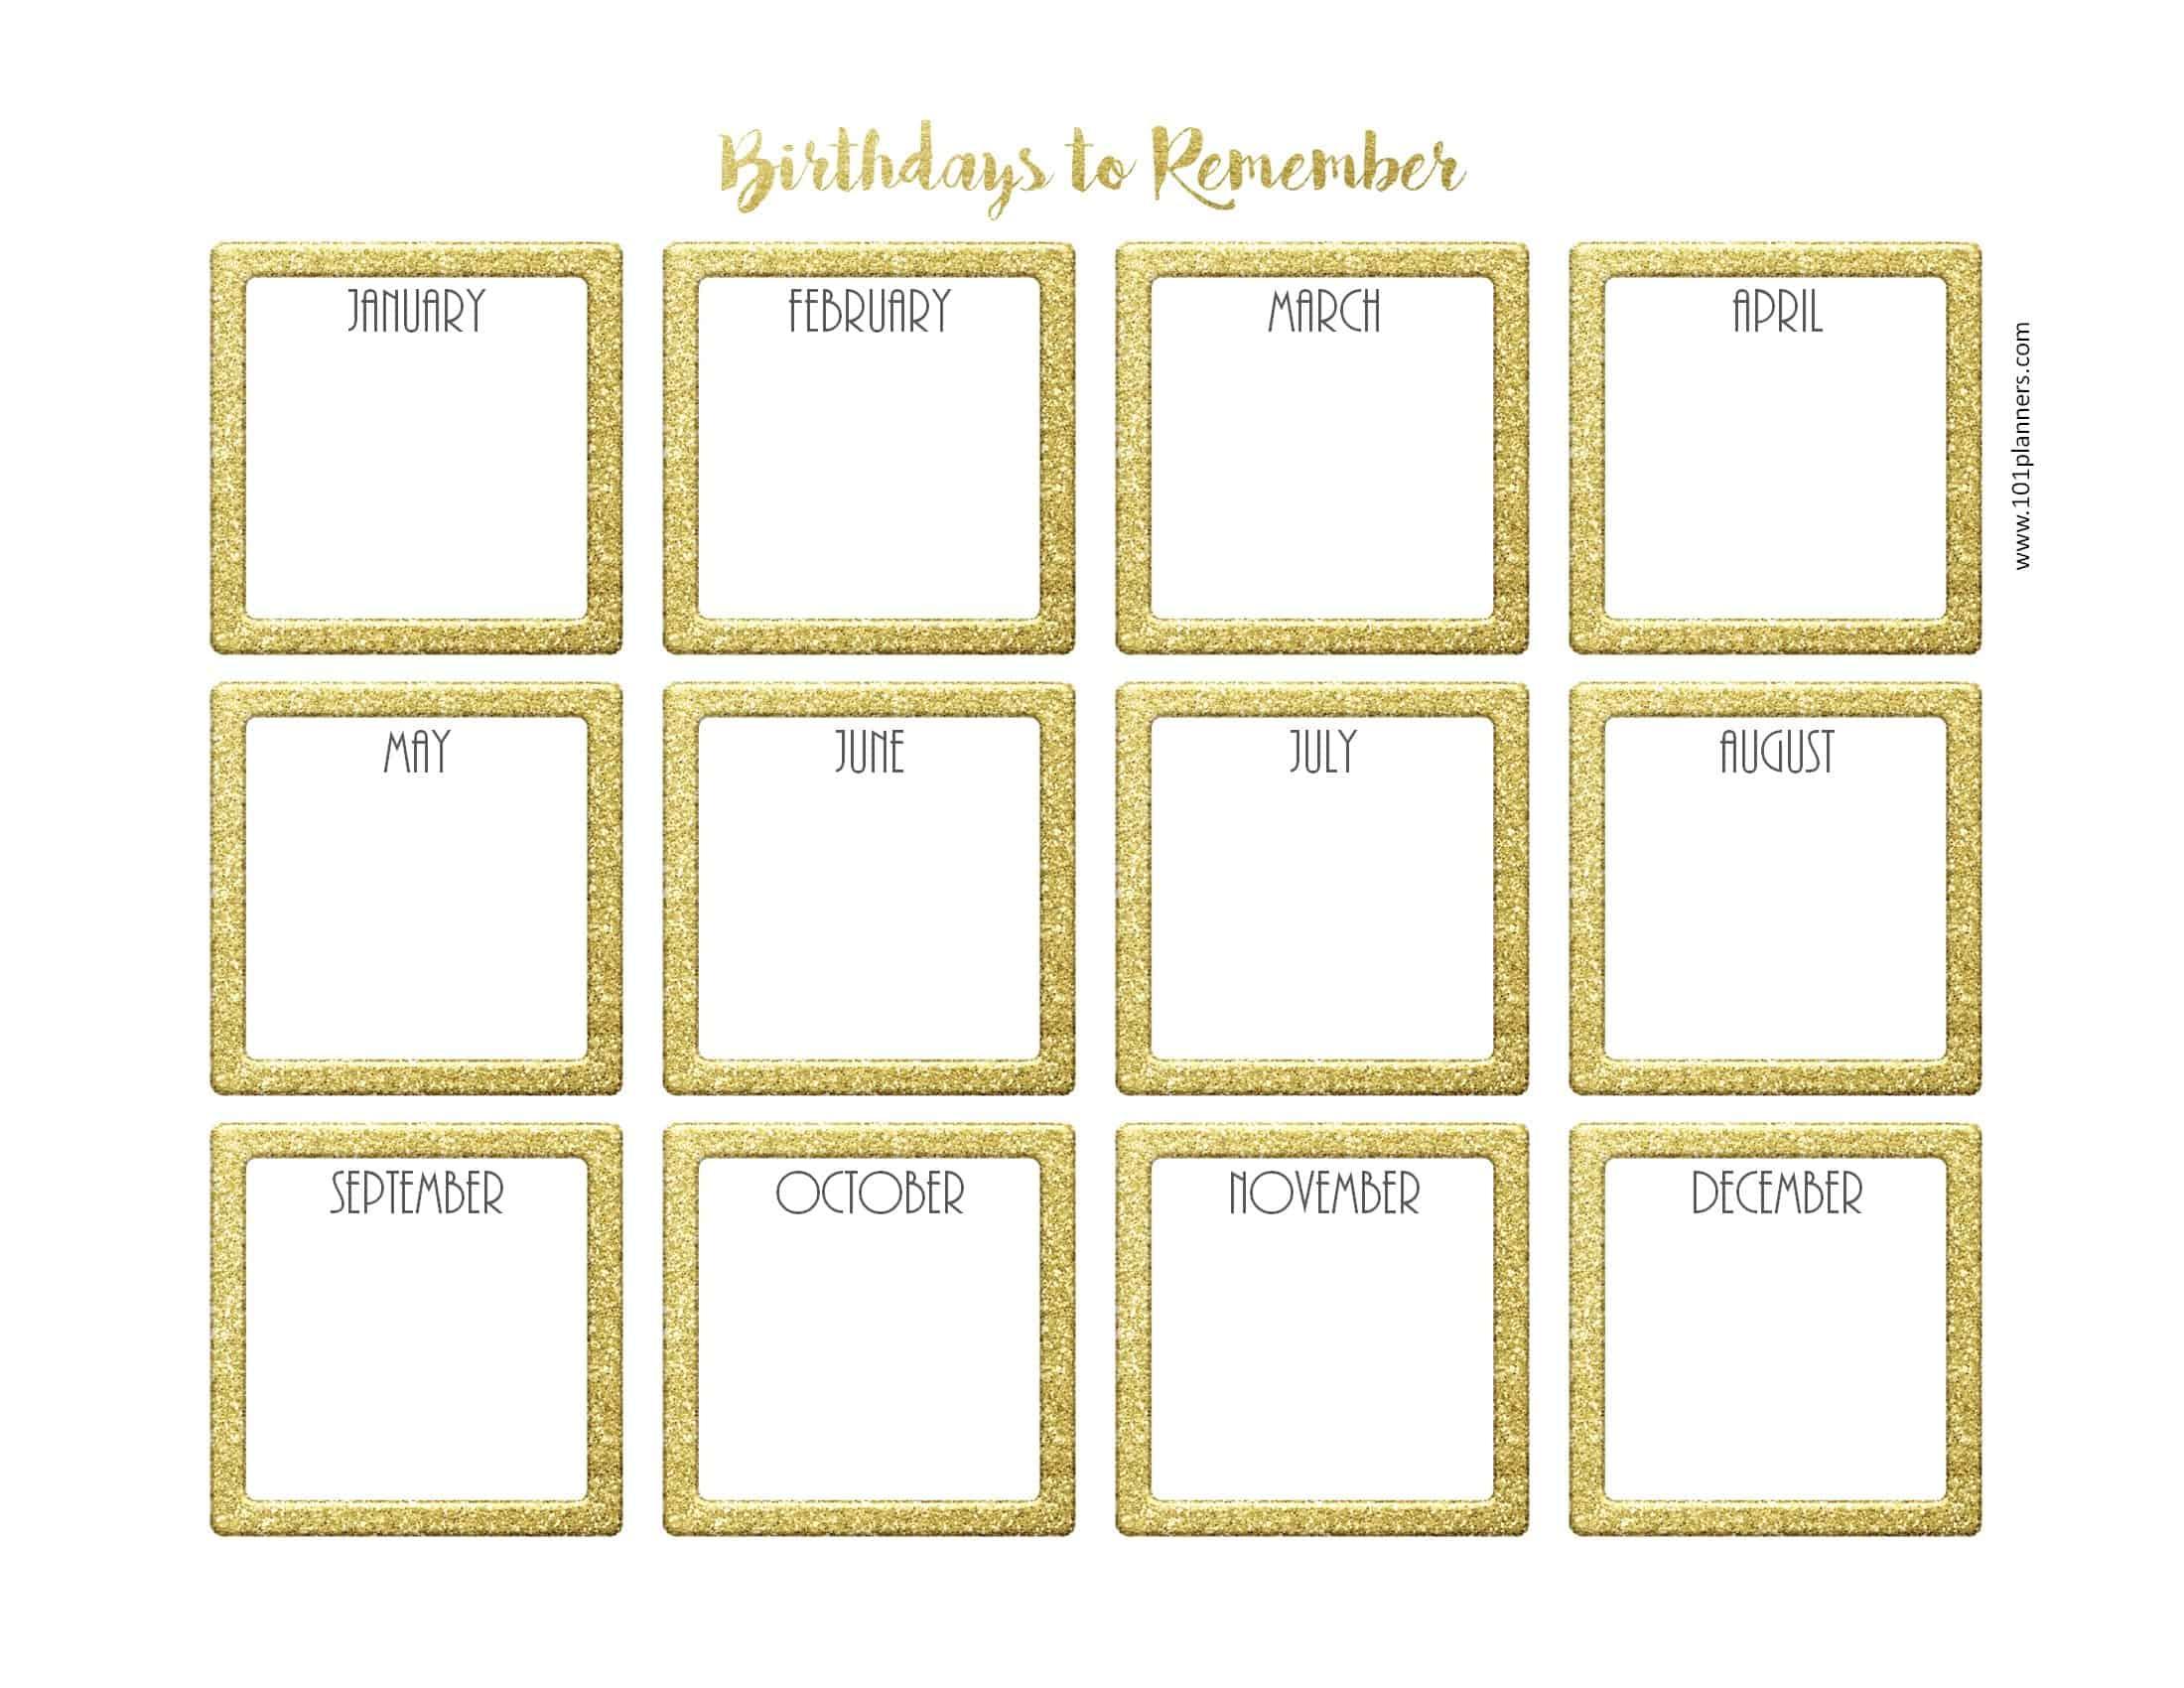 Free Birthday Calendar   Printable & Customizable   Many Designs! with regard to Monthly Birthday Calendar Template